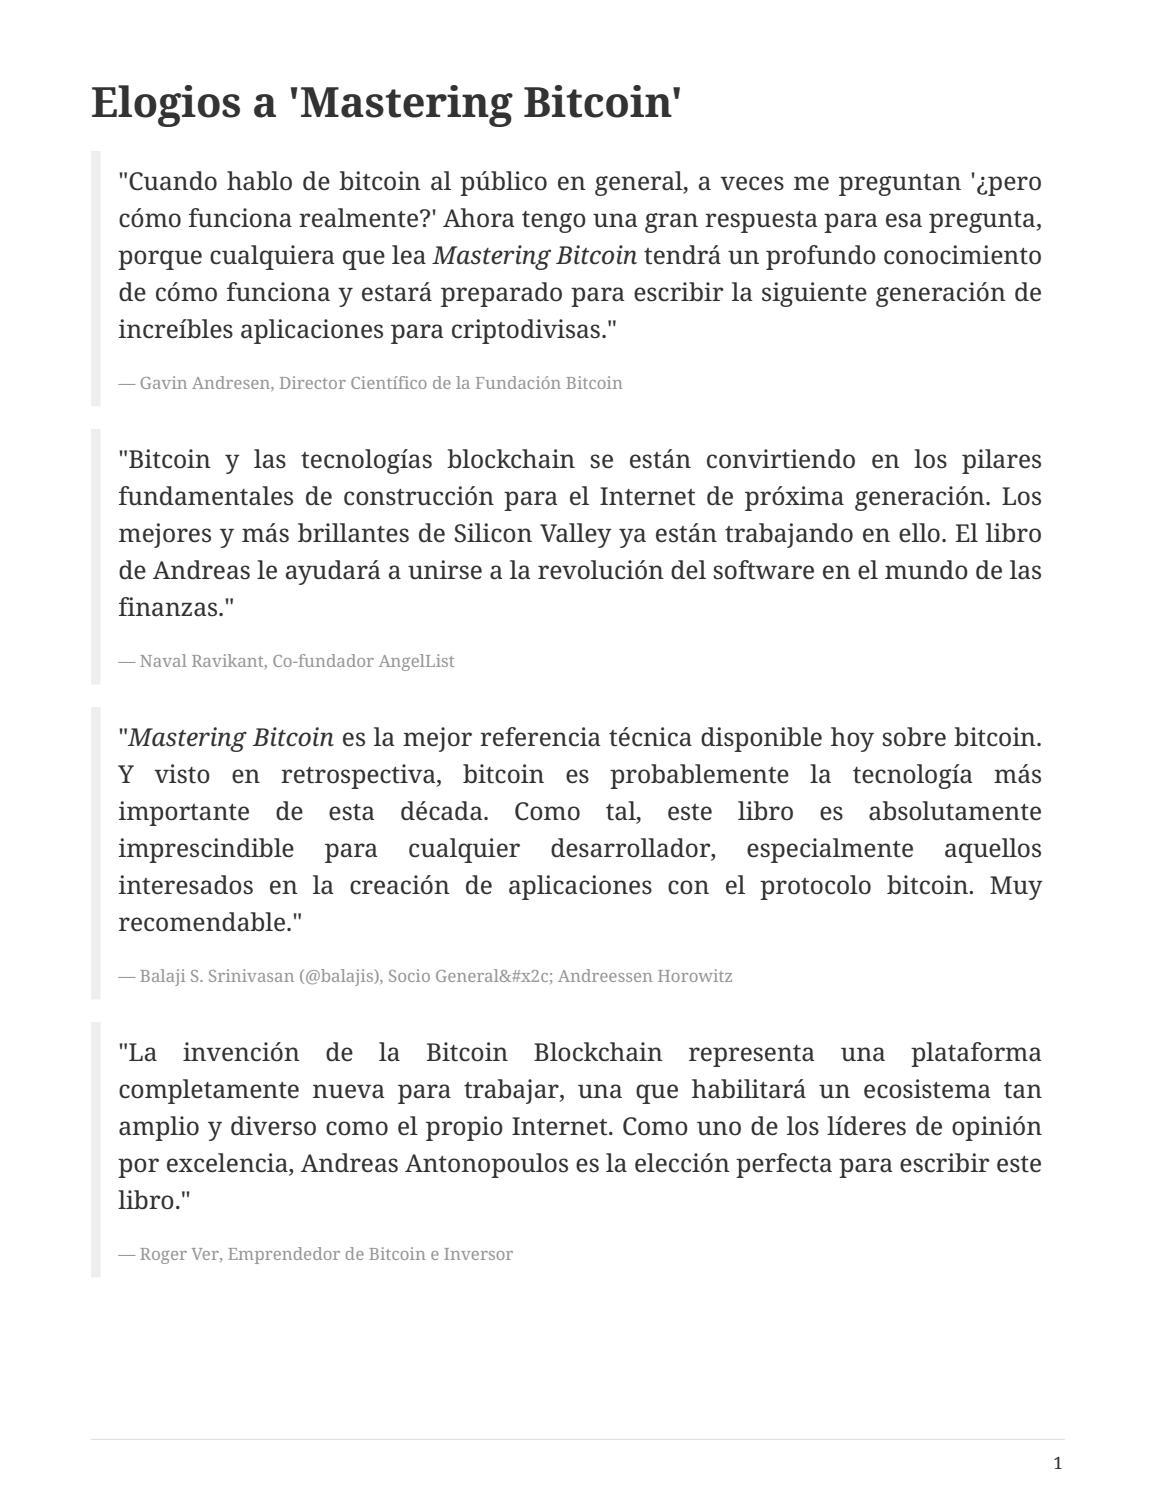 Dominando el bitcoin by Rubén F. M. - issuu